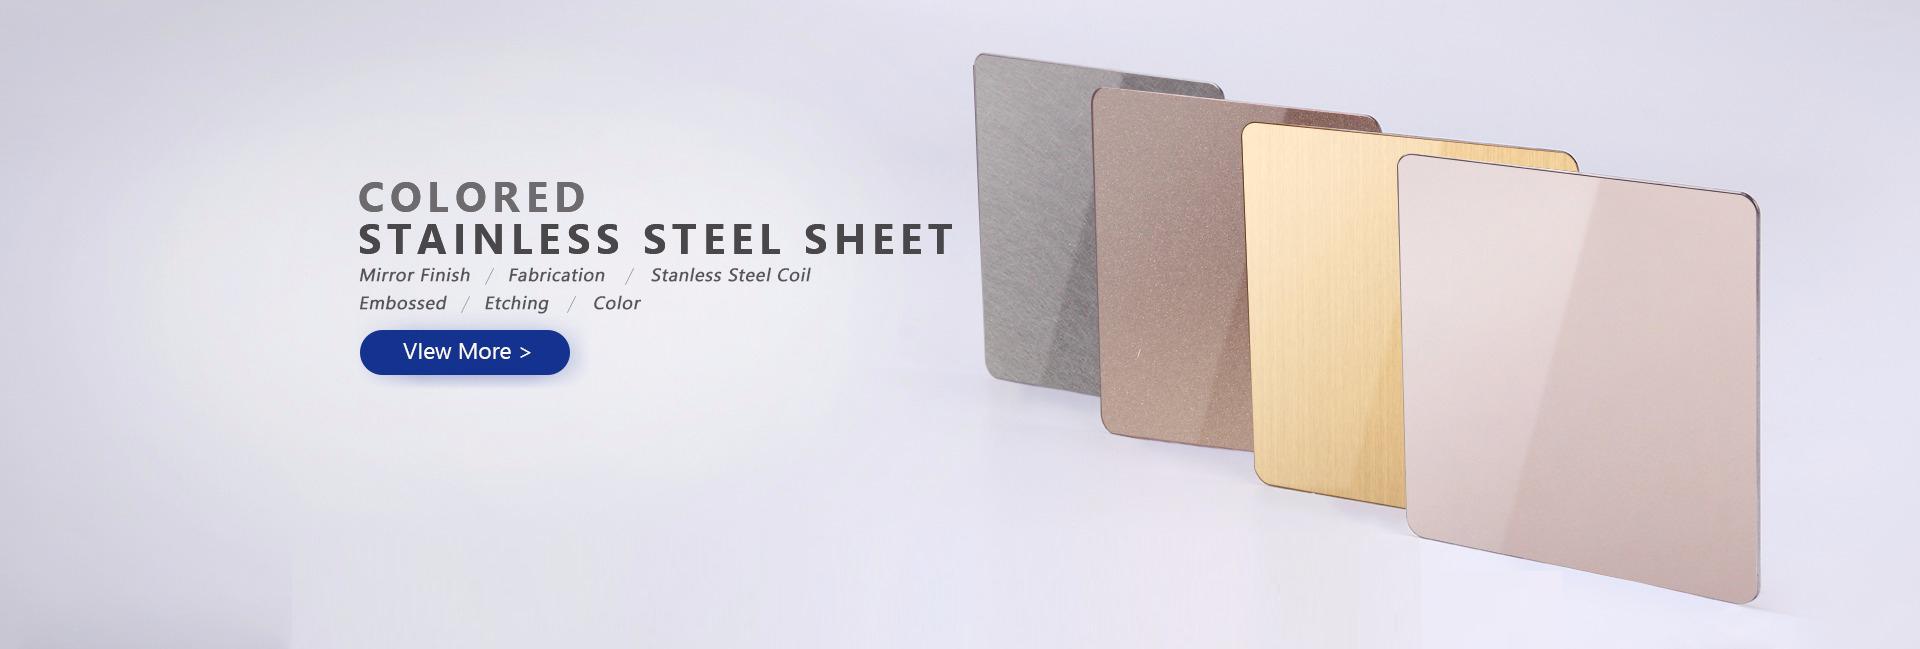 meibaotai decorative sheets